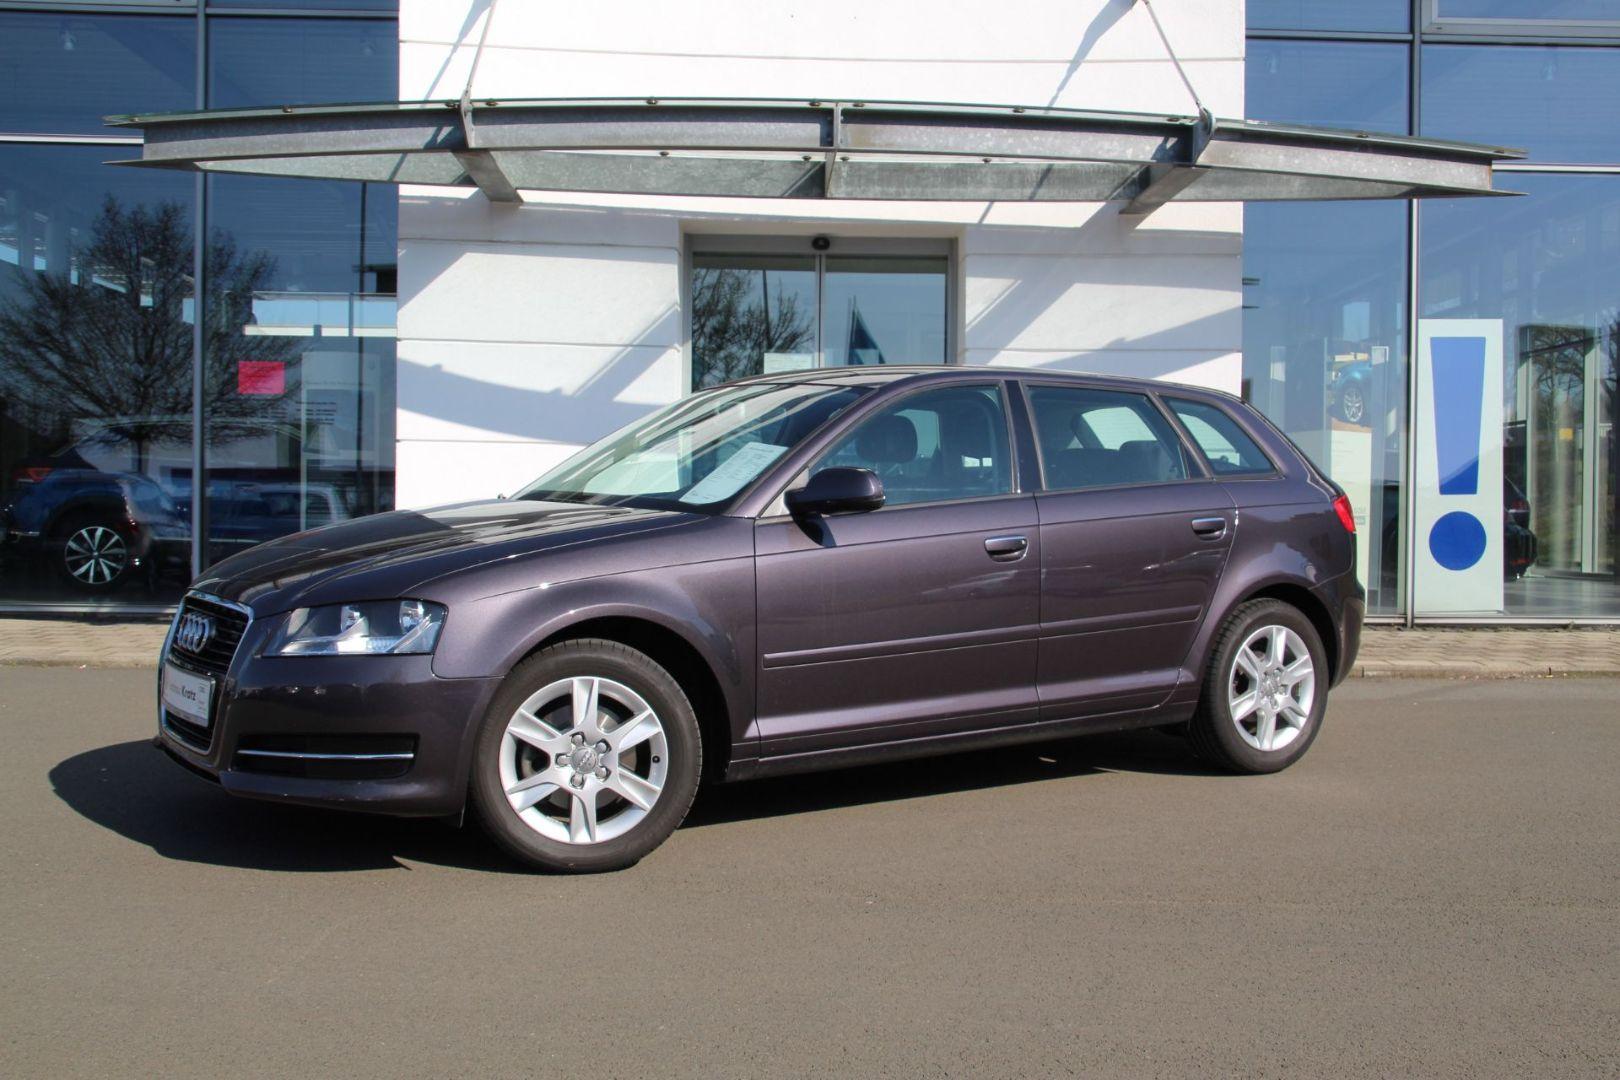 Audi A3 Sportback Attraction 1.4 TFSI, Jahr 2012, Benzin